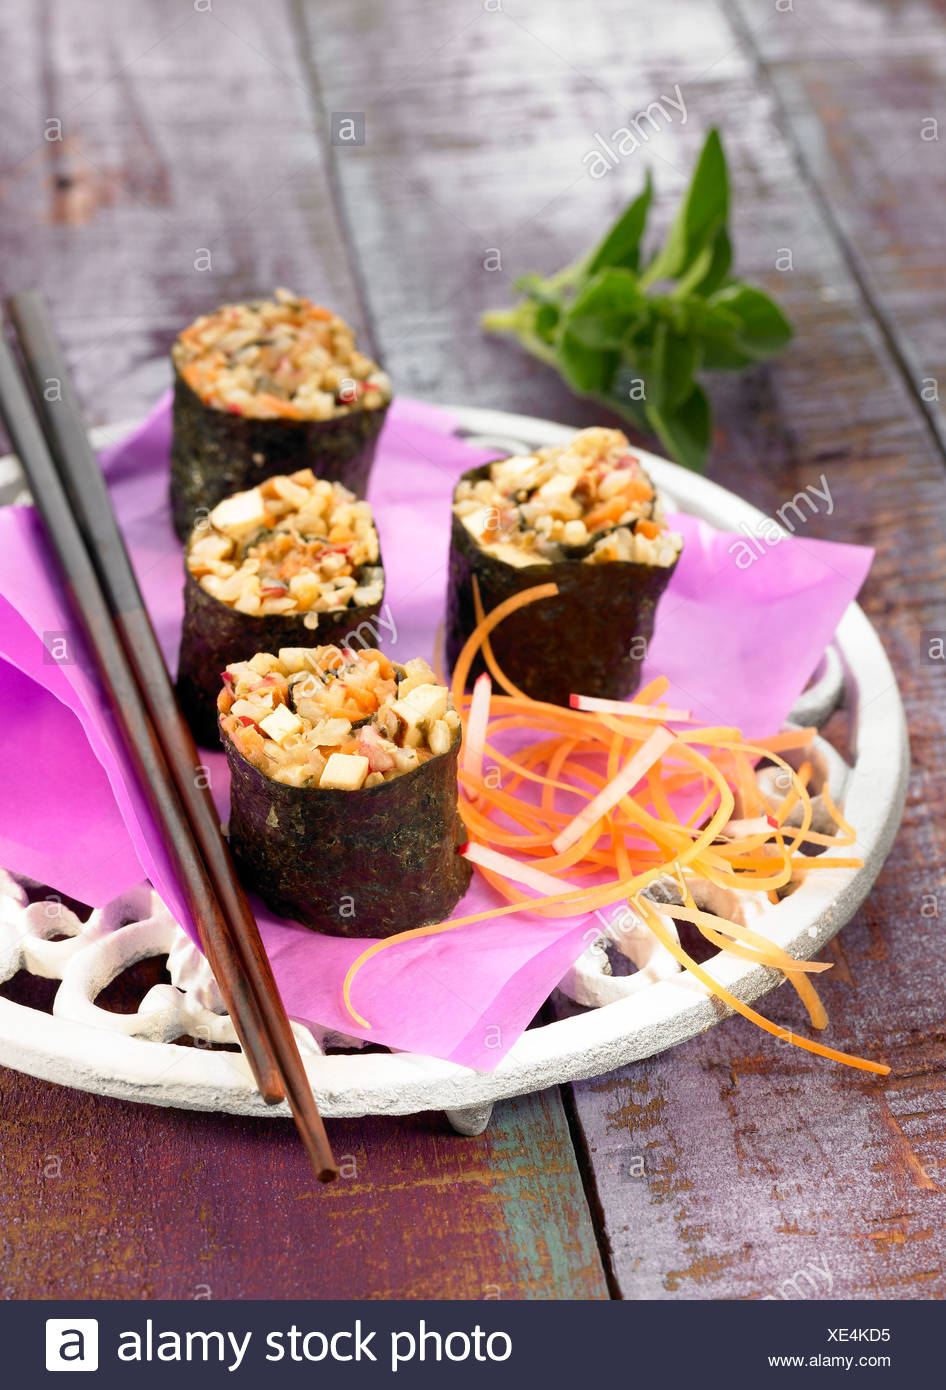 Wholemeal rice and smoked tofu Nori rolls - Stock Image